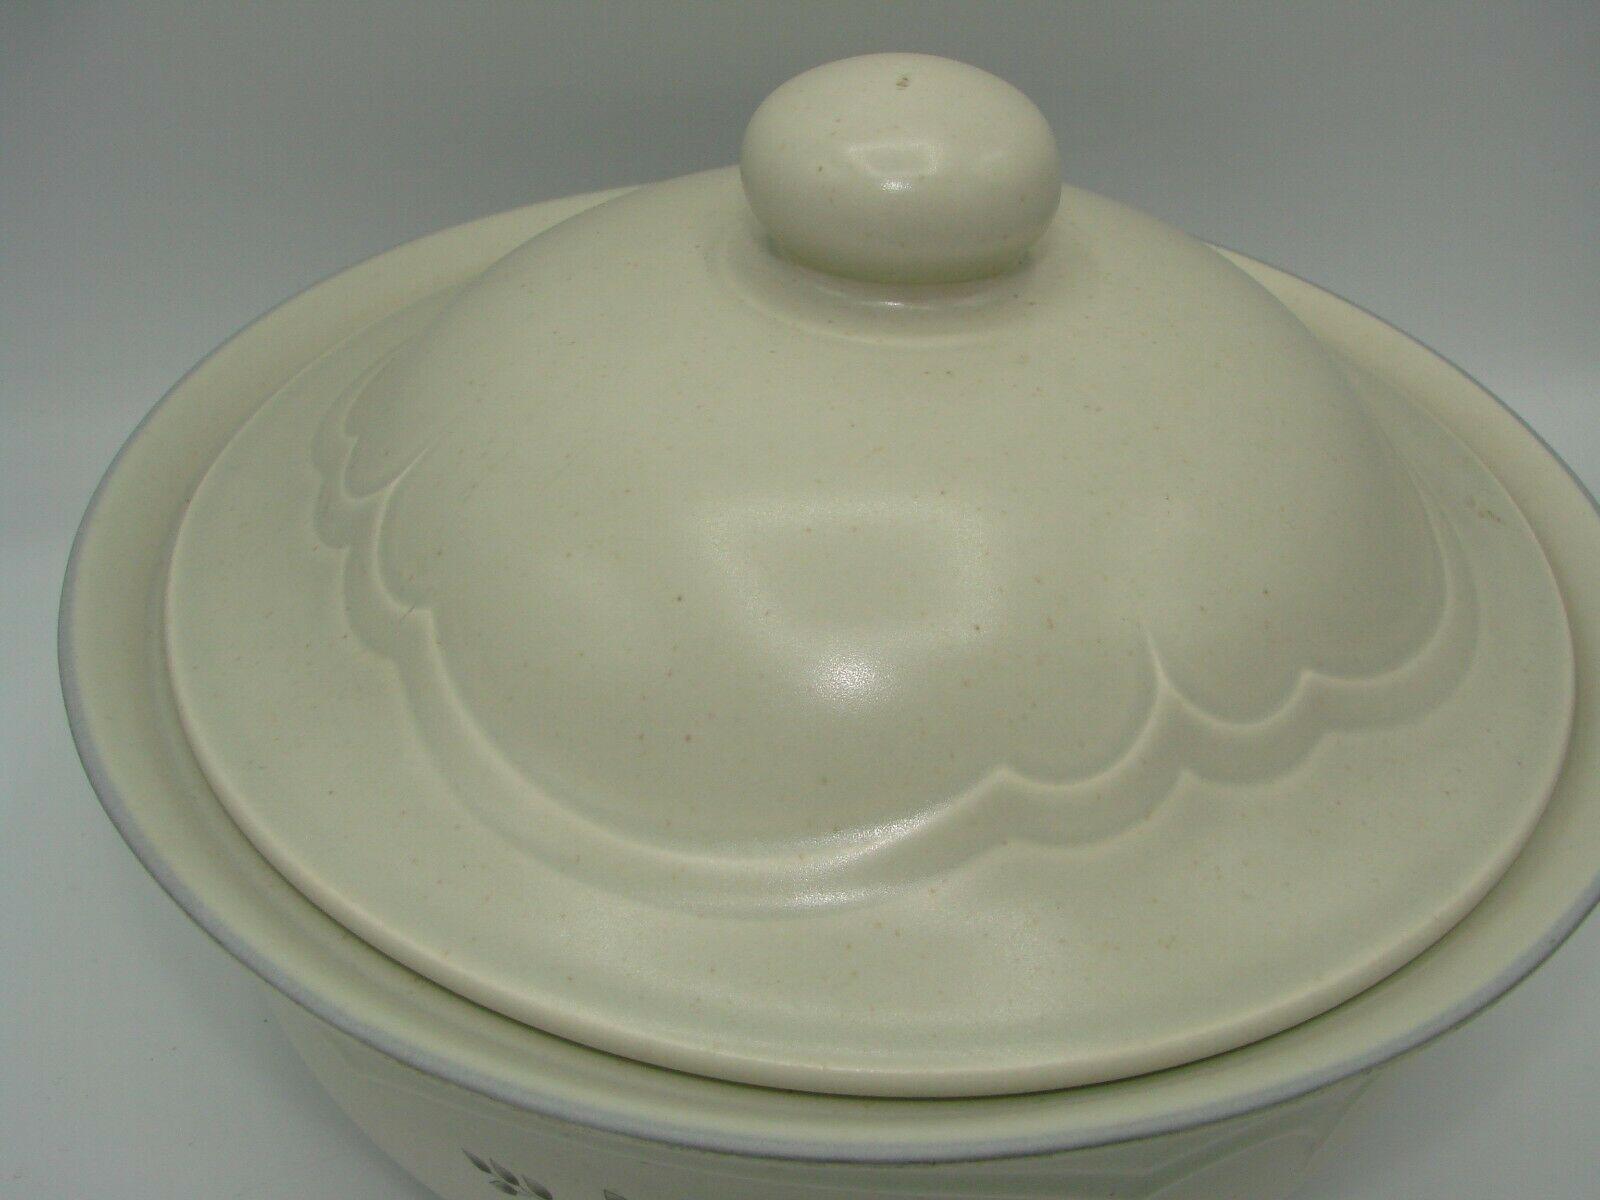 Pristine Pfaltzgraff Heirloom Covered Casserole Dish 8.75 2 Quart White Flowers image 3